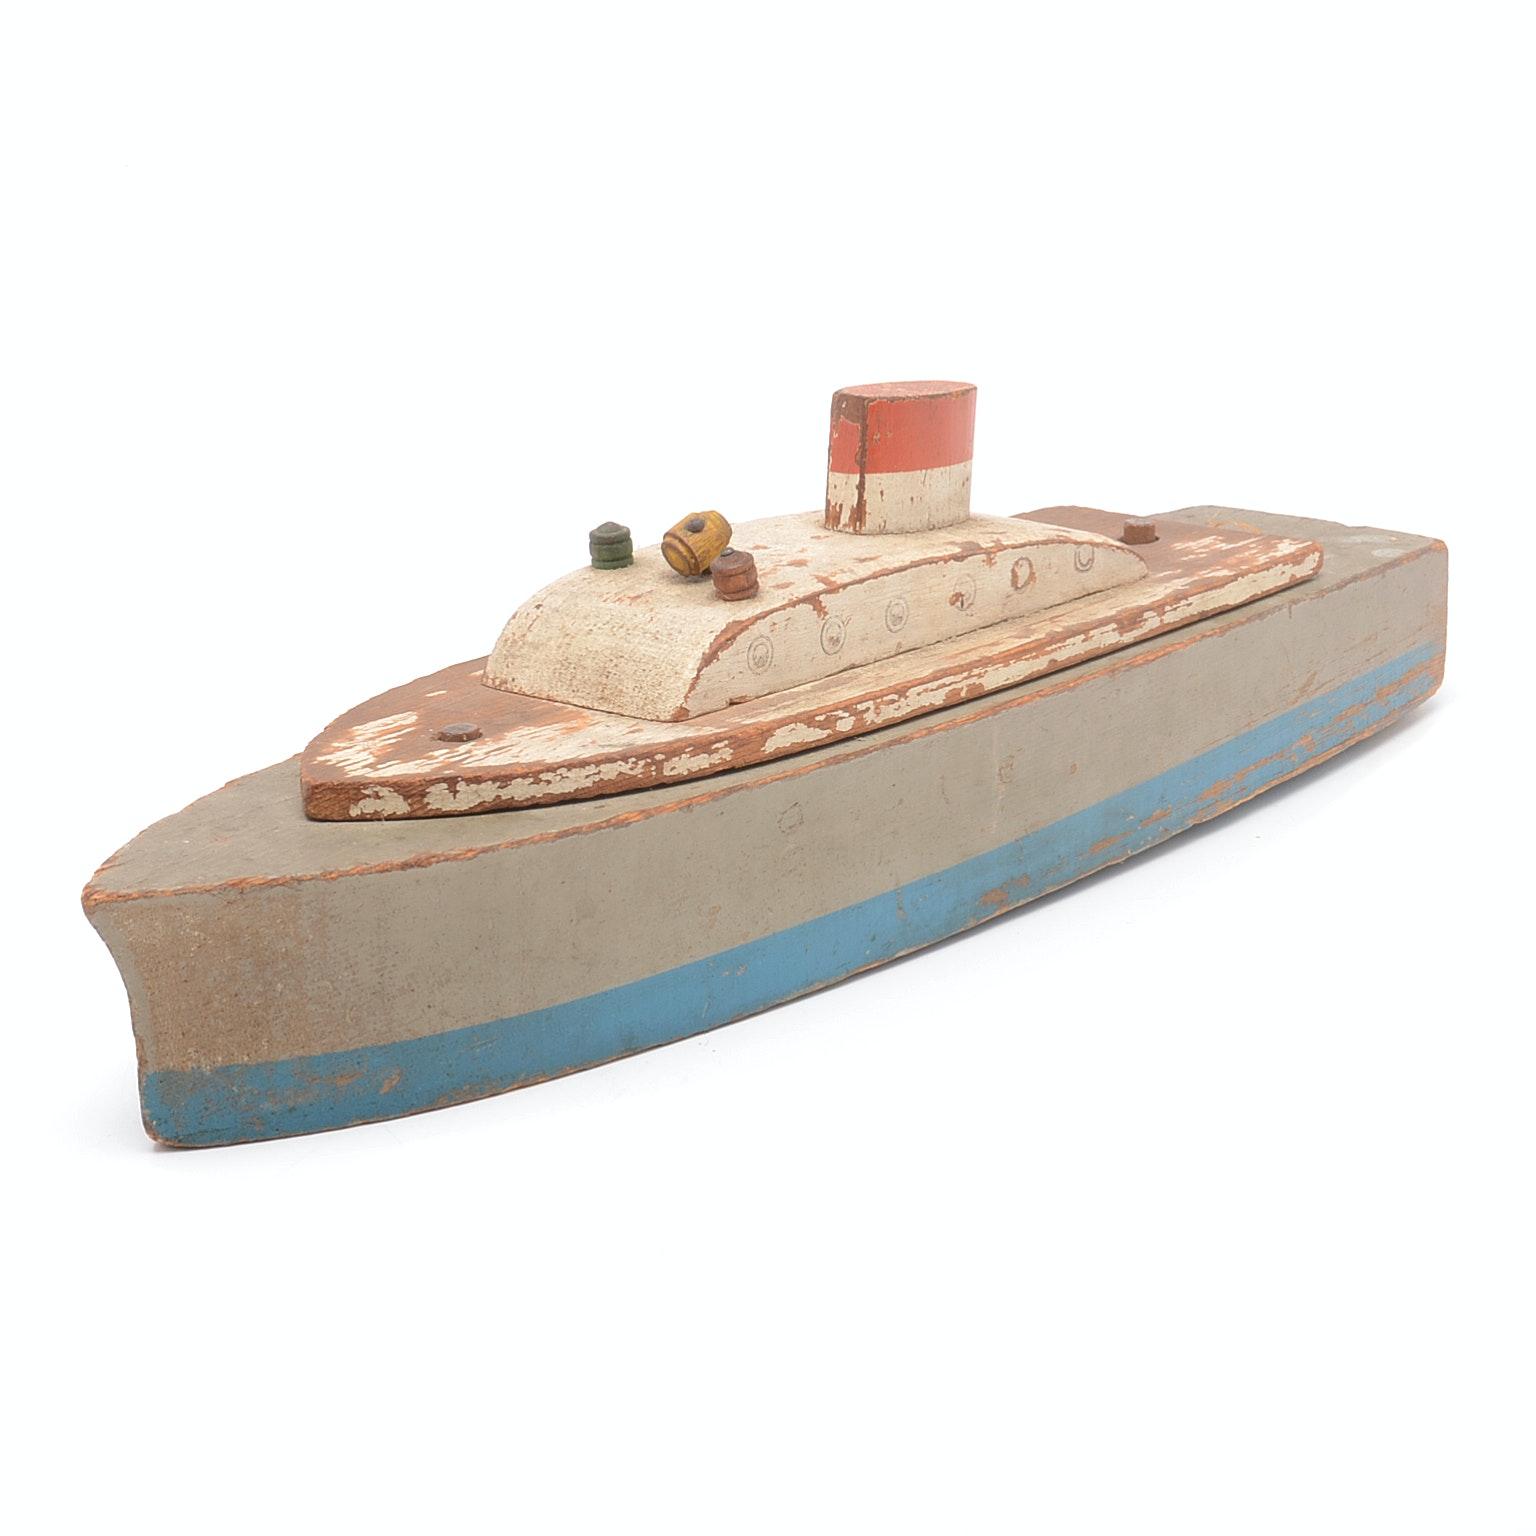 Vintage Folk Art Toy Wood Boat